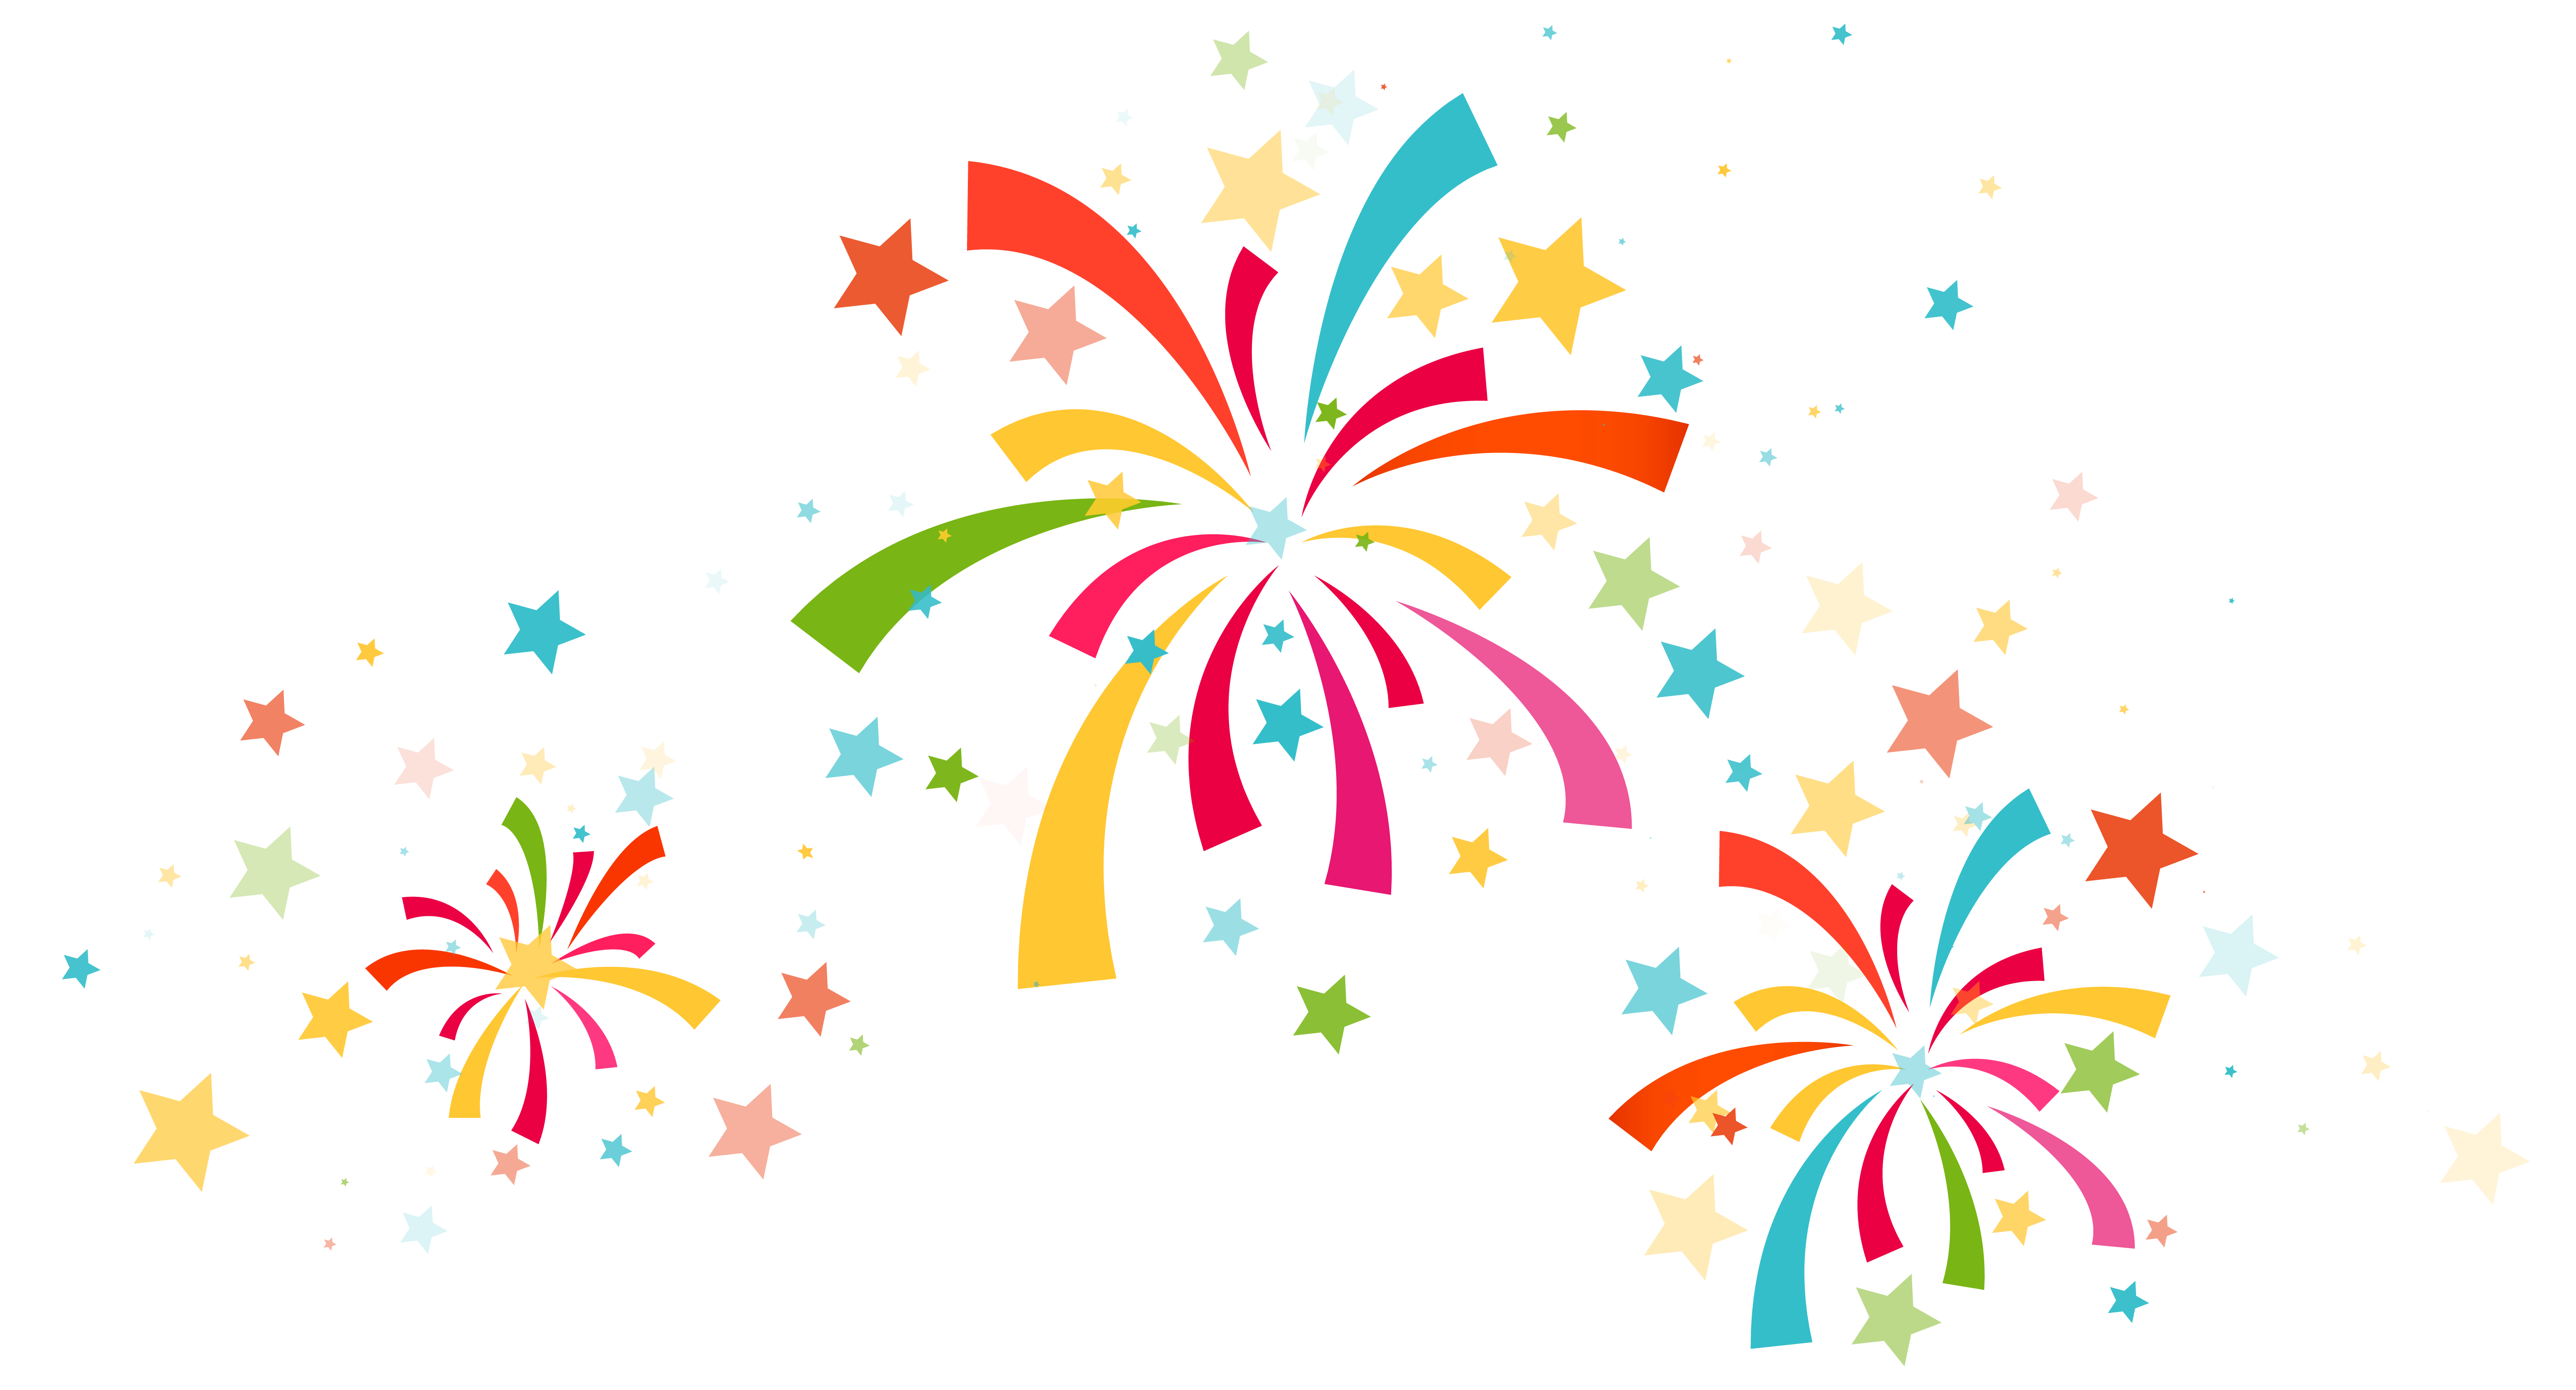 Star confetti clipart clipart stock Confetti Decoration PNG Clipart Image | Gallery Yopriceville - High ... clipart stock